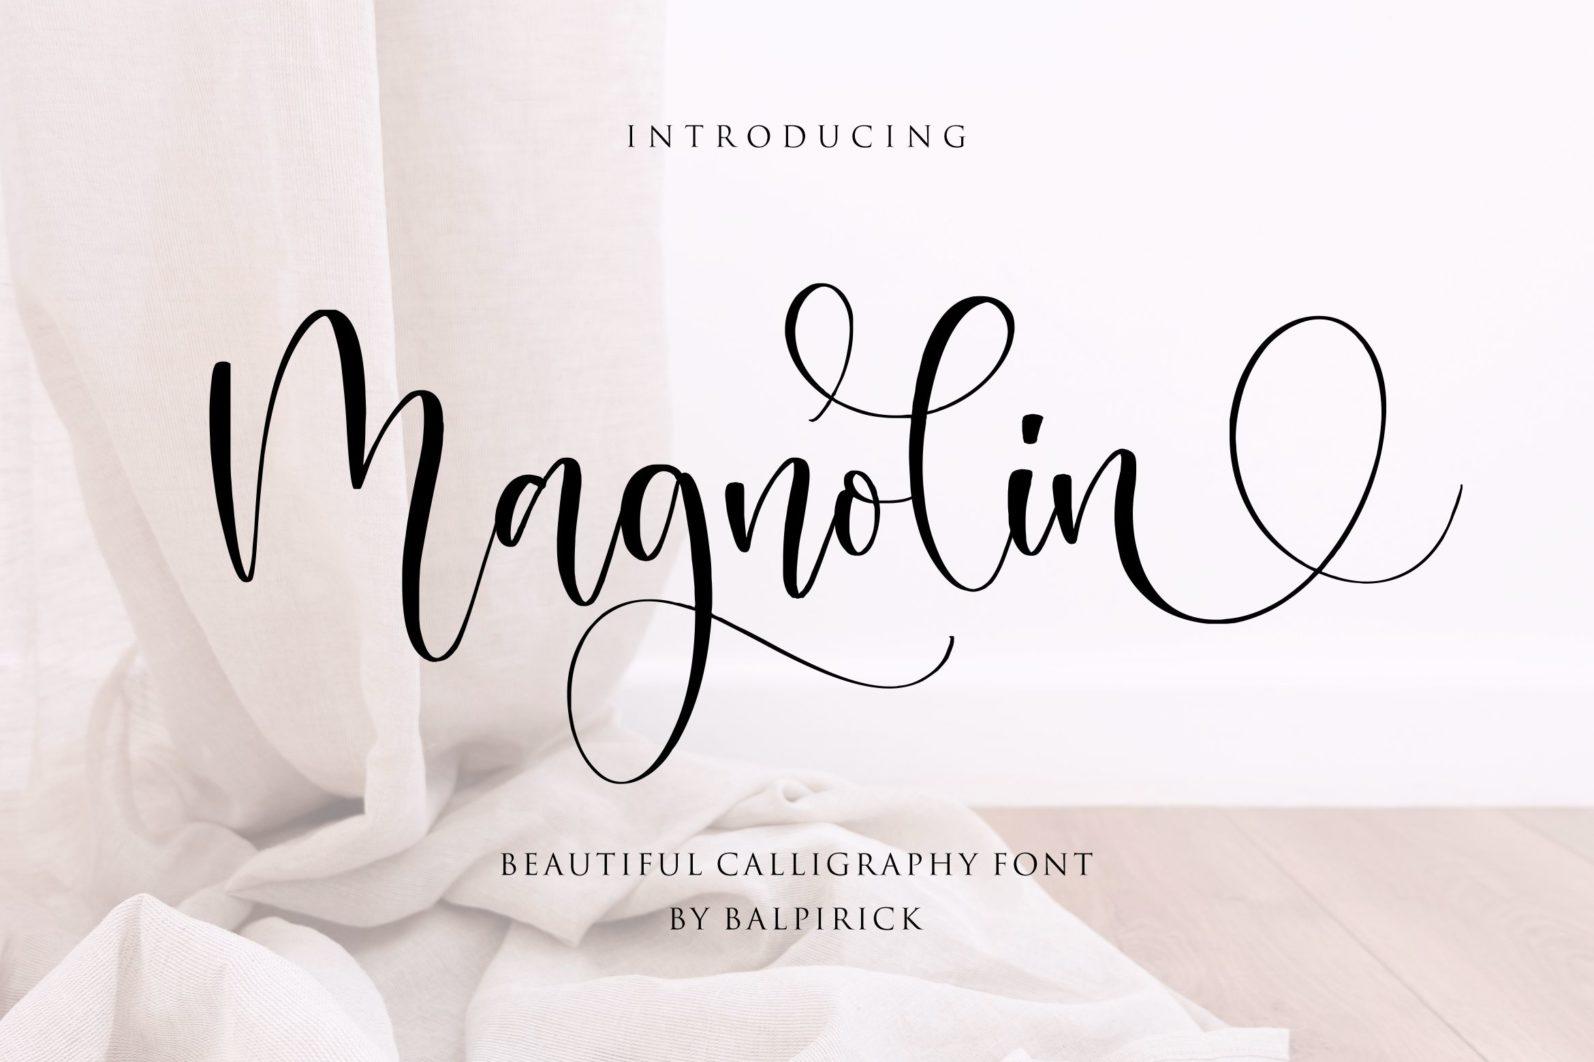 Magnolin Beautiful Calligraphy Font - 1 94 -